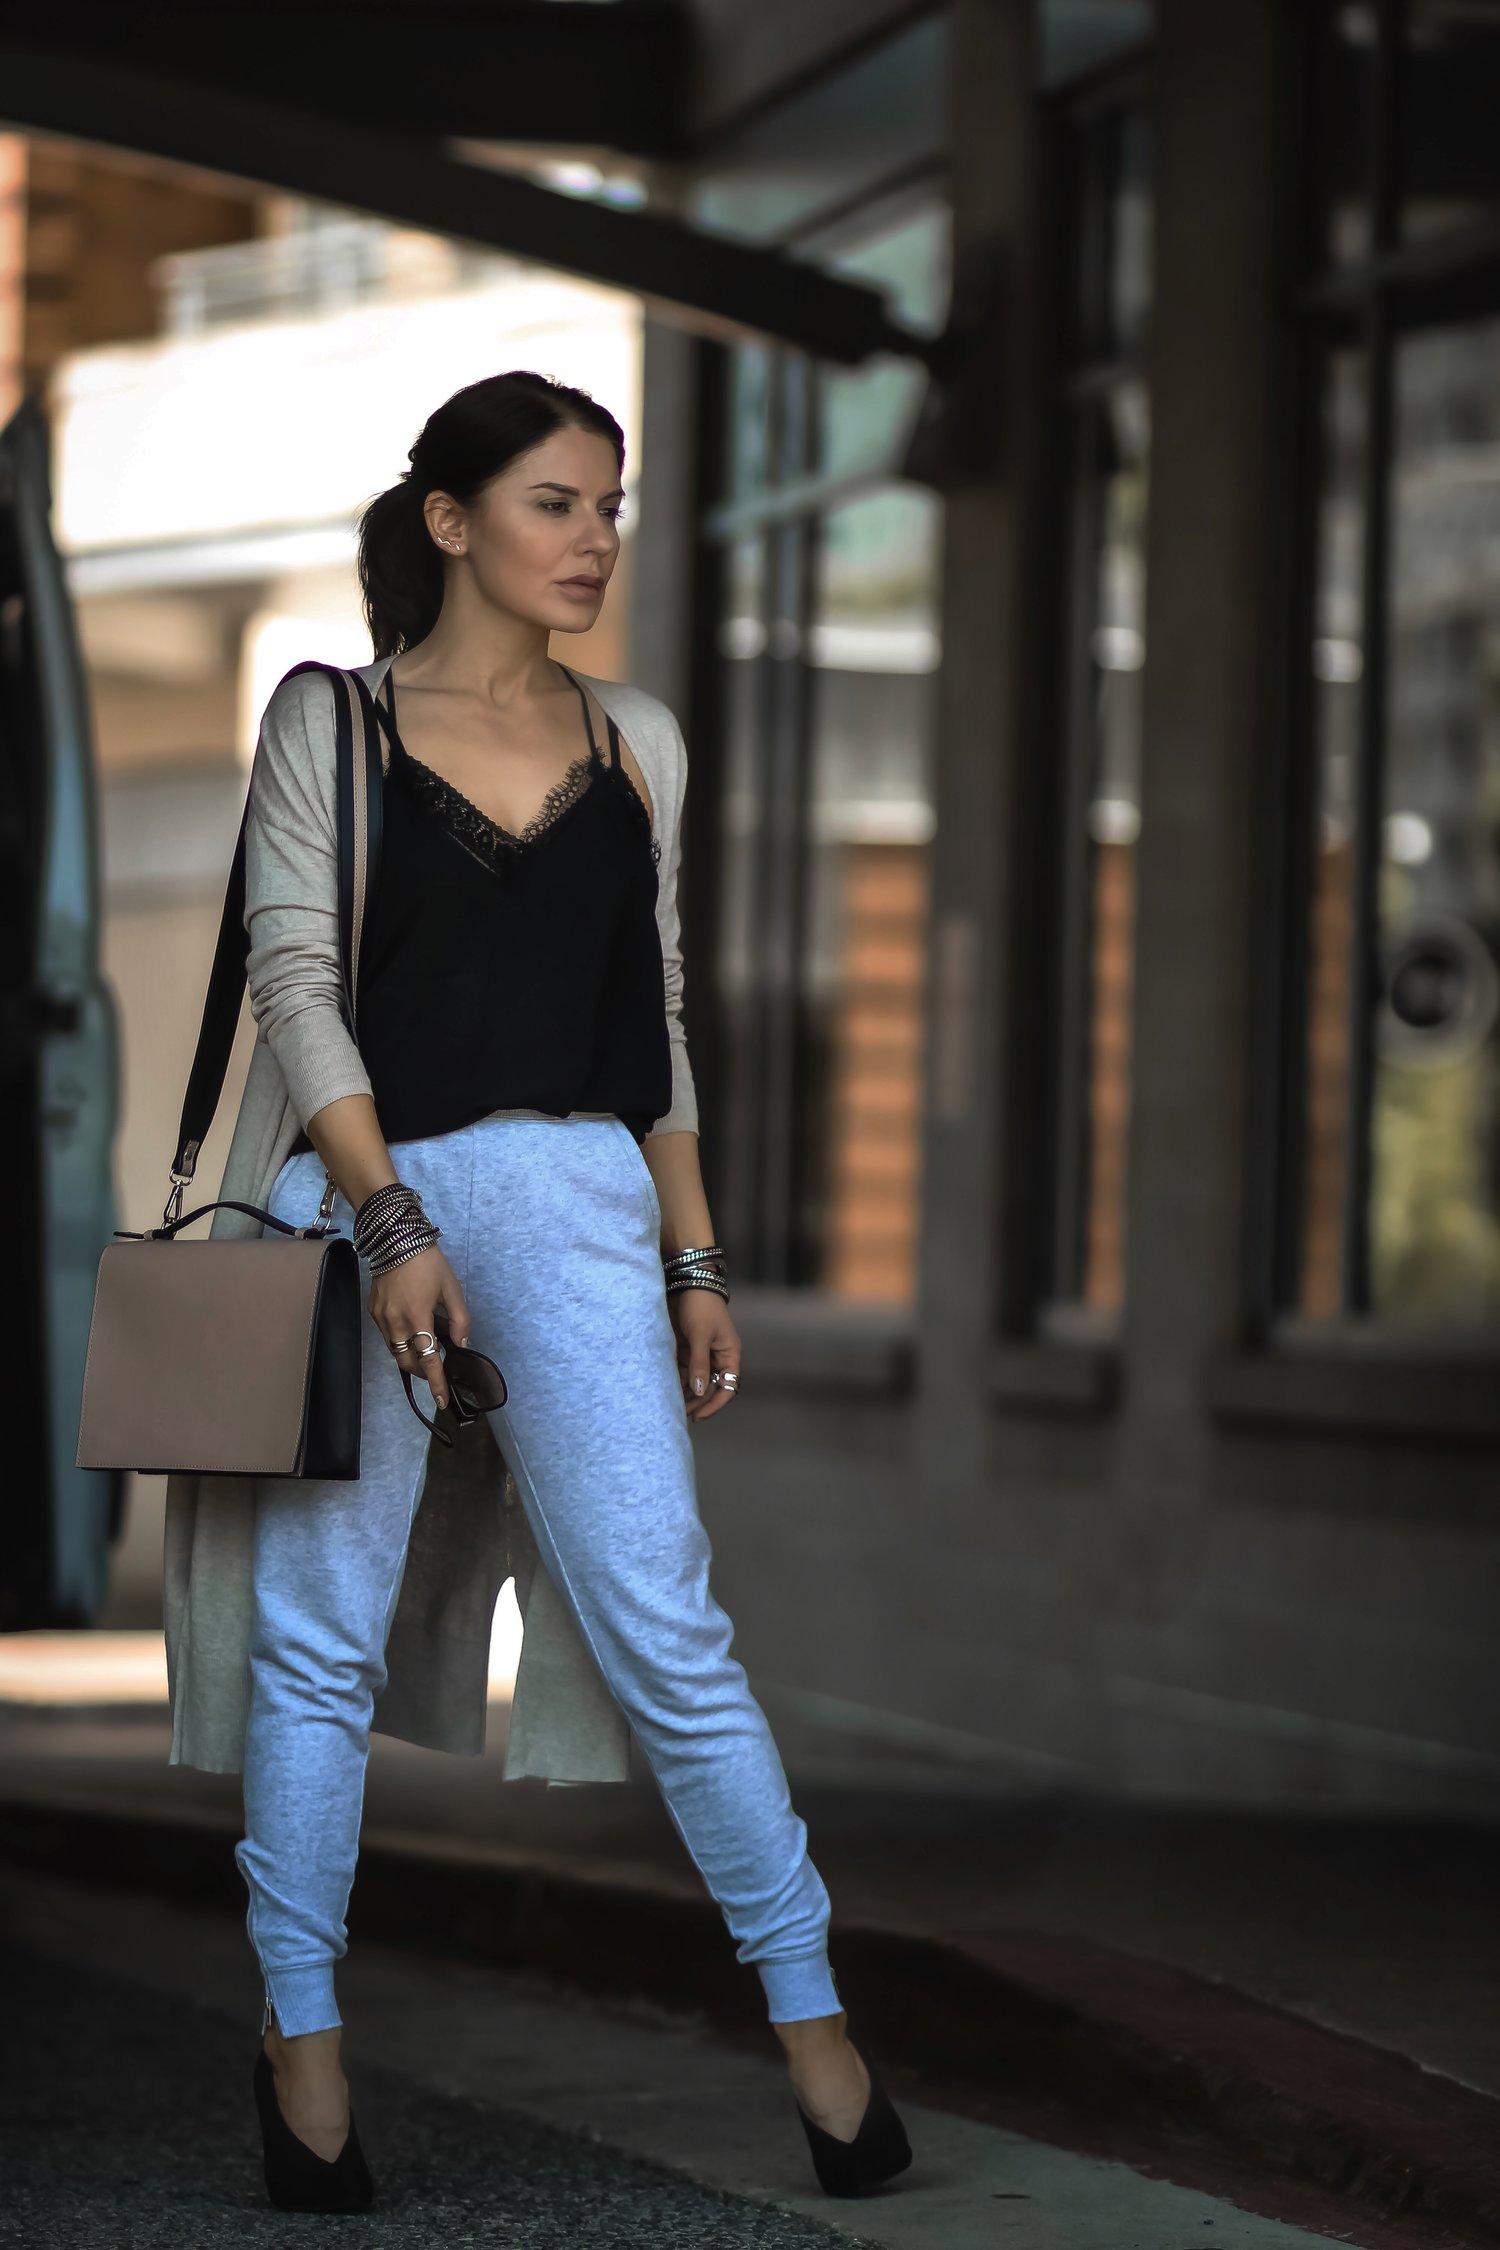 Isabel-Alexander-Old-Navy-tan-cardigan-athleisure-look-streetstyle.jpeg